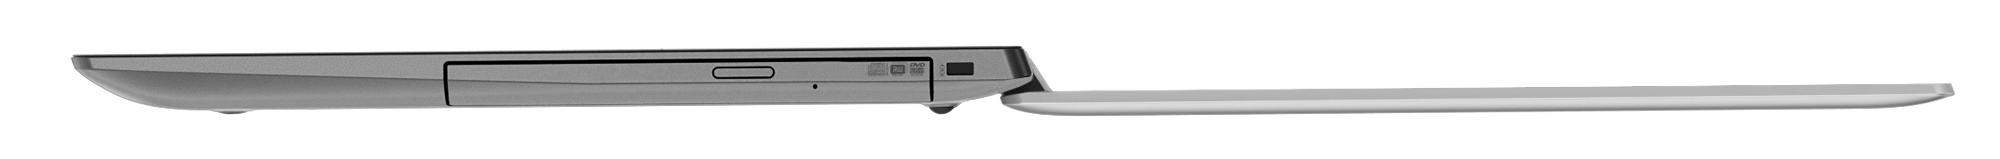 Фото  Ноутбук Lenovo ideapad 330-15 Platinum Grey (81D100LXRA)